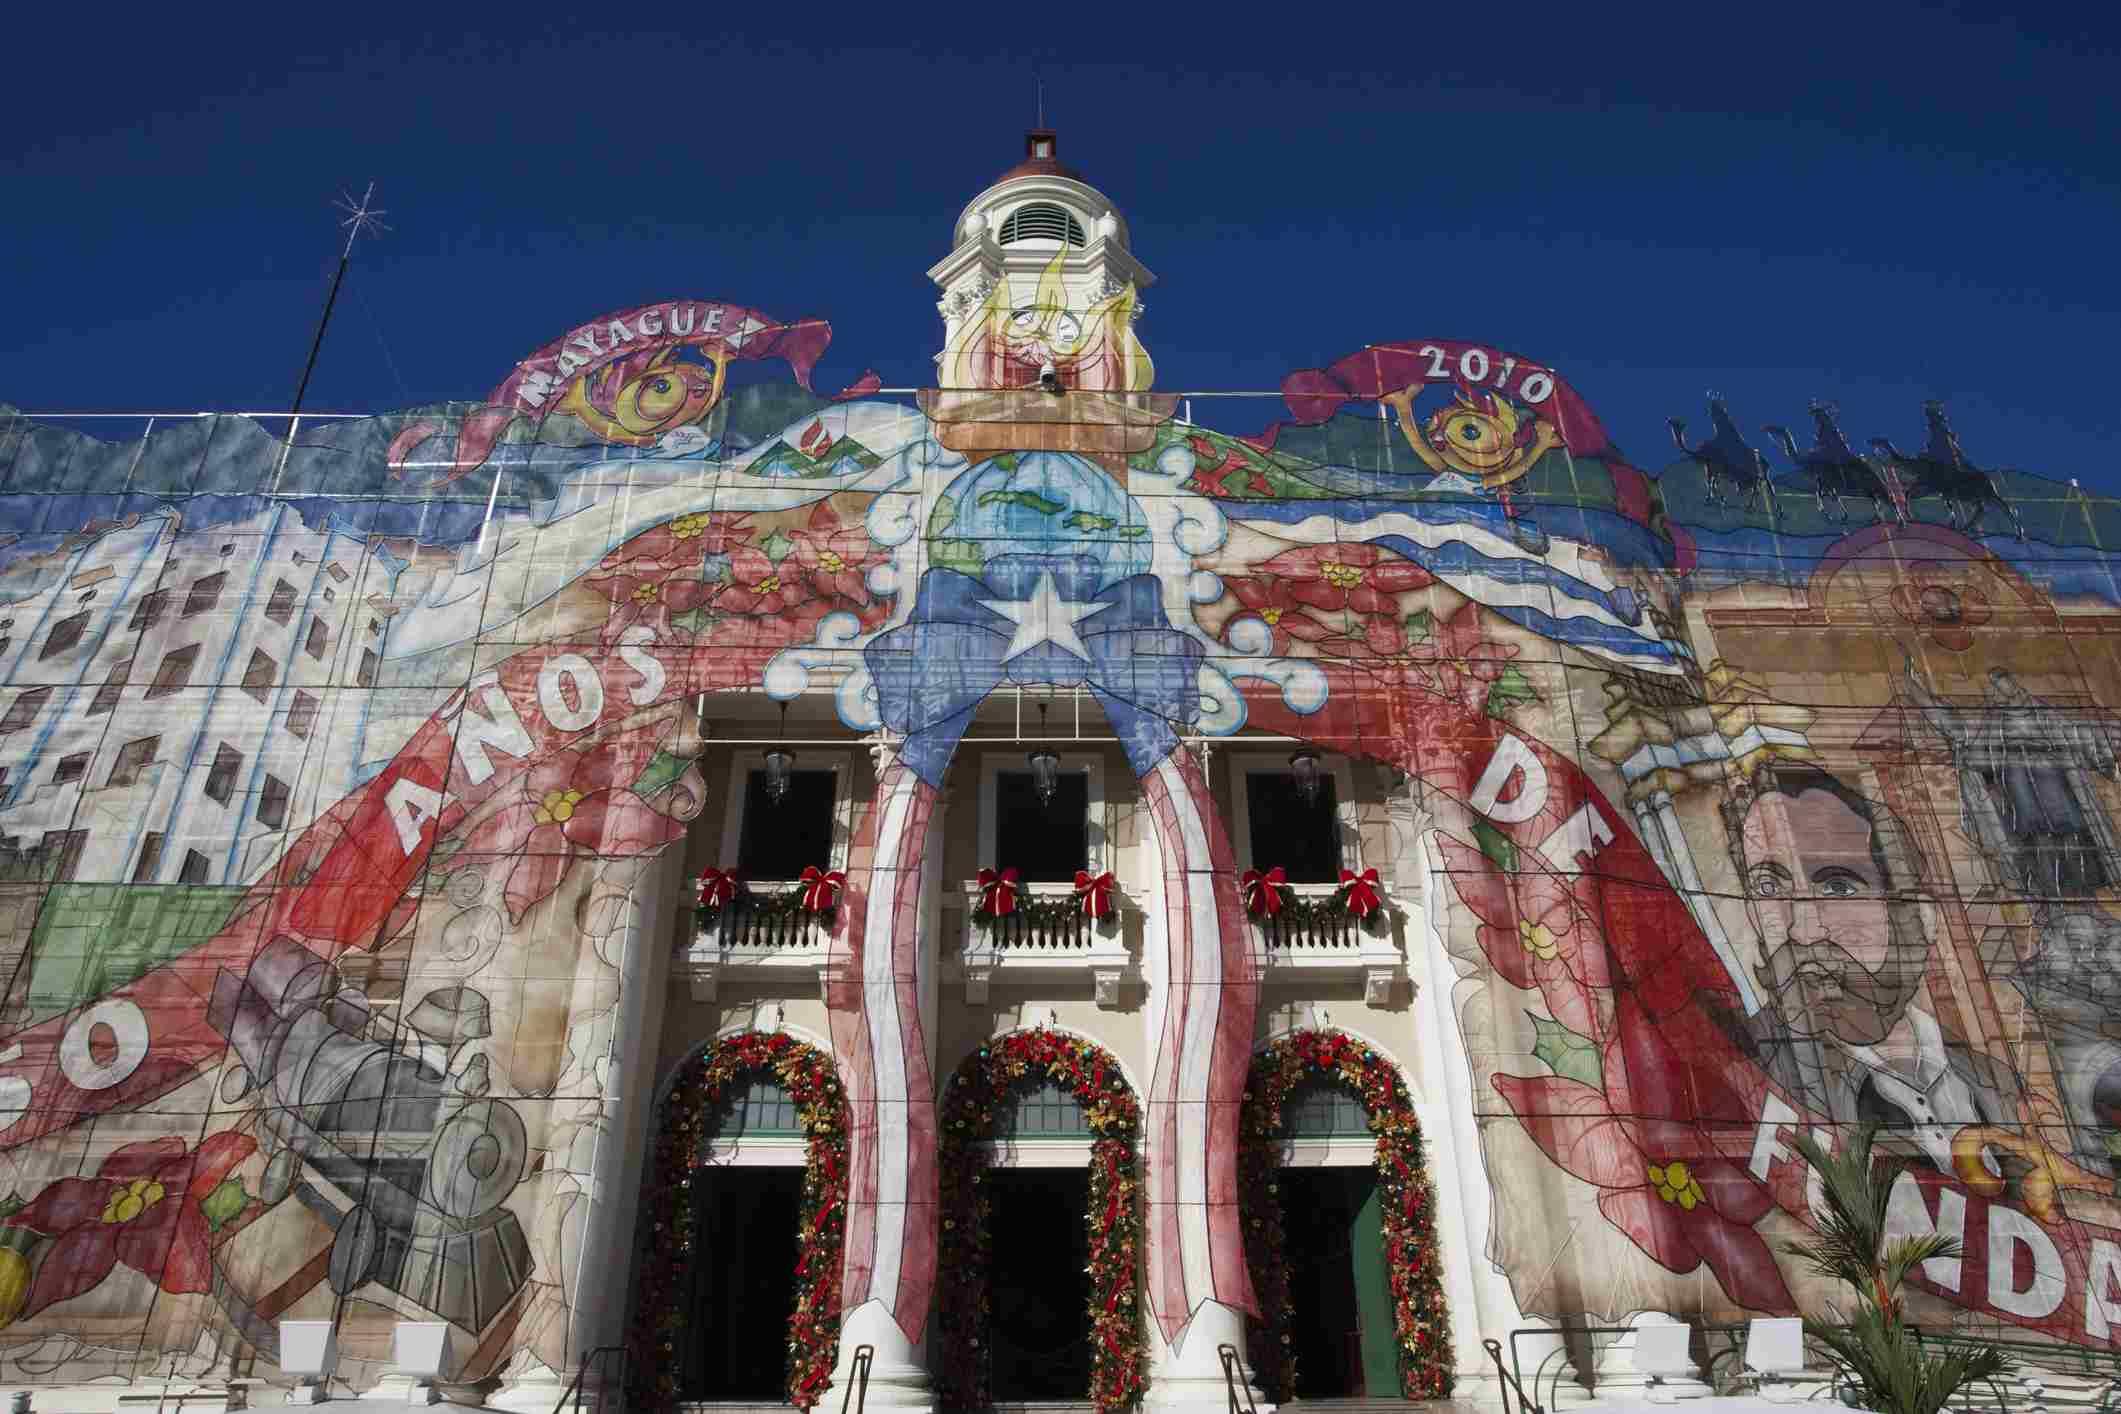 Teatro Yaguez with Christmas decorations, Plaza Colon, Mayaguez, Puerto Rico